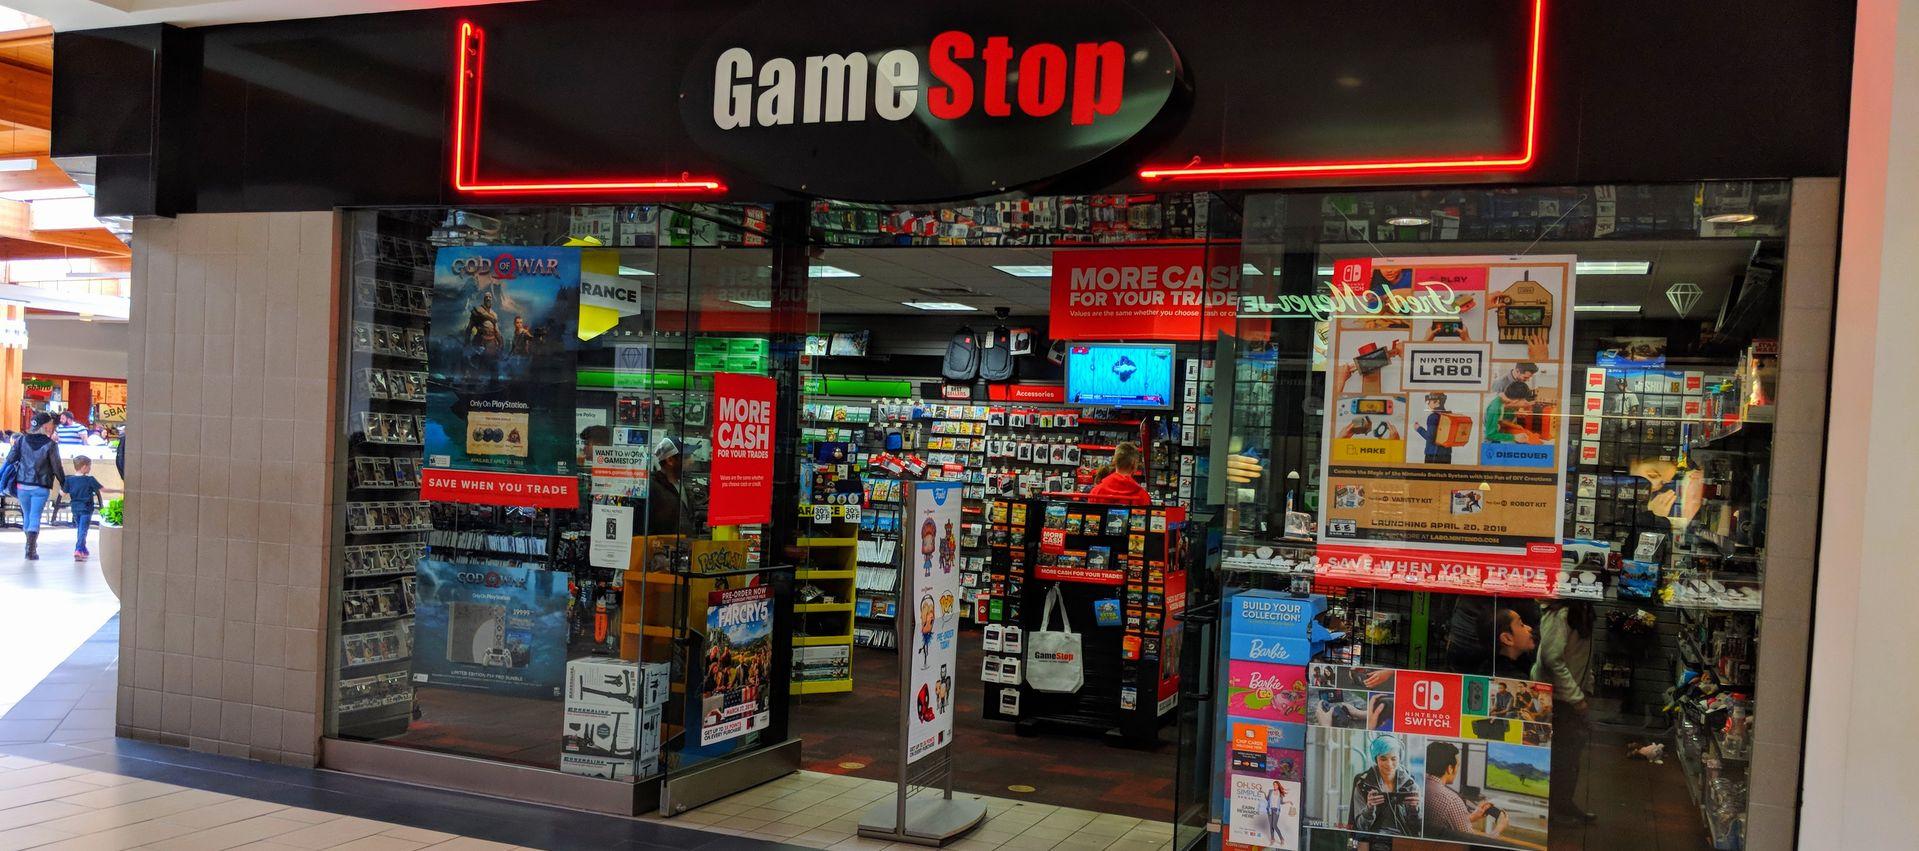 Gamestop היתה הנסחרת ביותר באמריקה כמה פעמים בשבוע שעבר. צילום: shutterstock